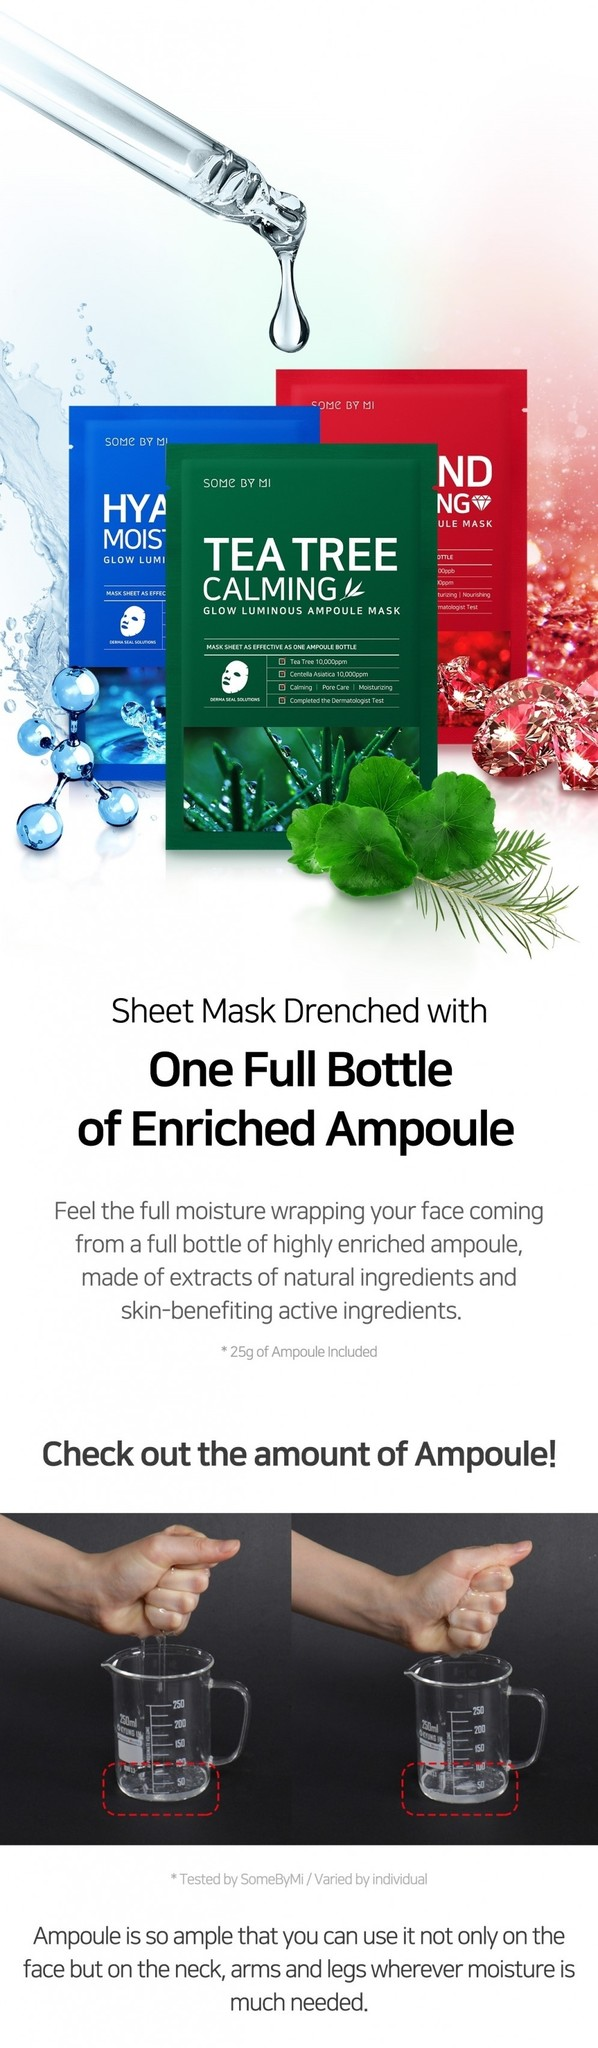 Tea Tree Calming Glow Luminous Ampoule Mask-3